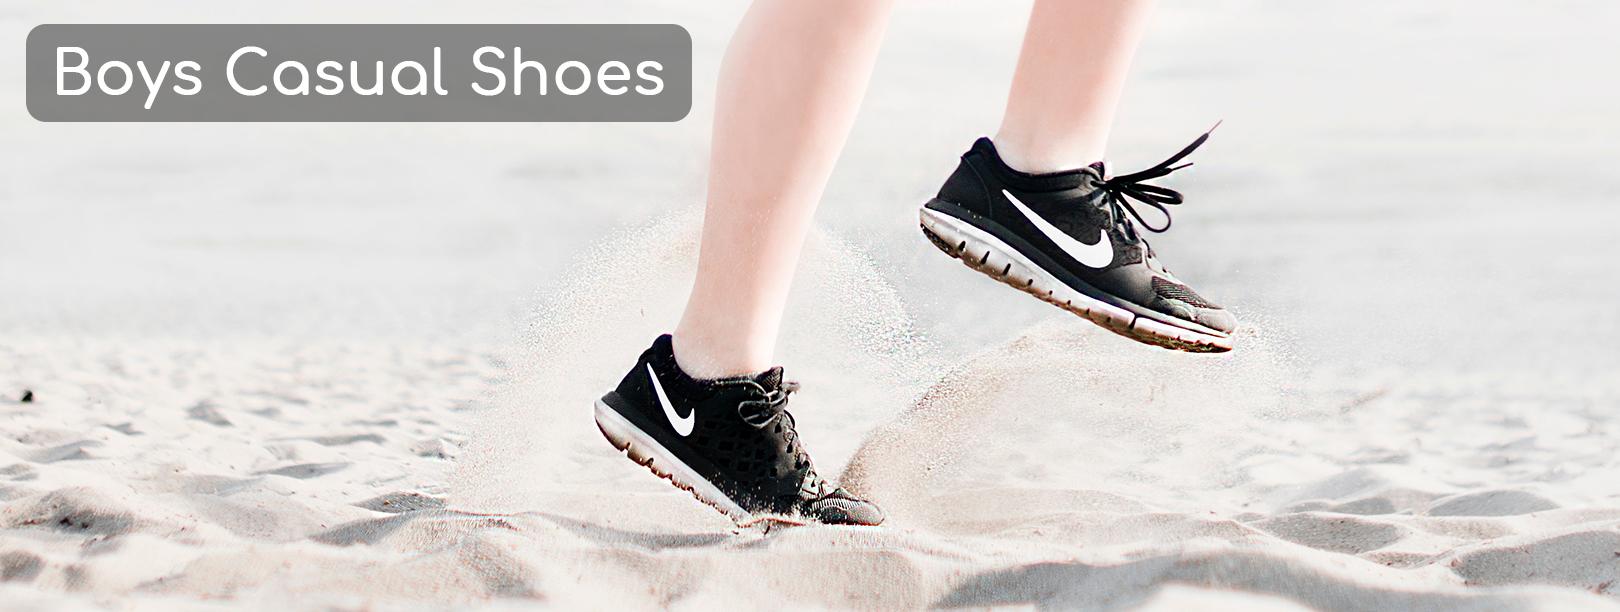 Flipkart Boys Casual Shoes